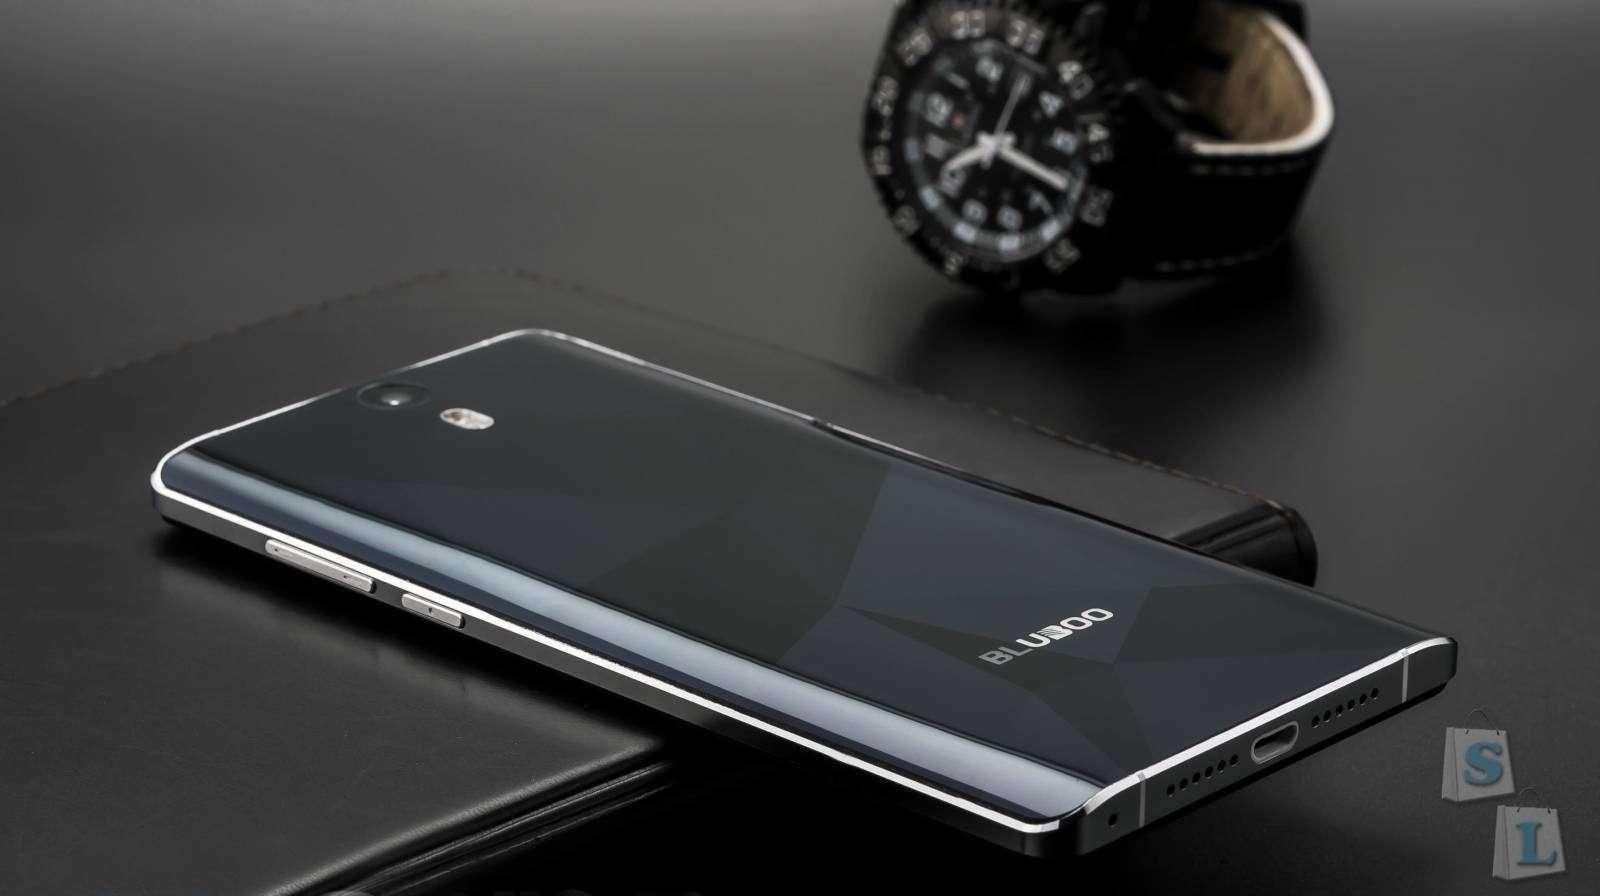 Shopper: Обзор смартфона Bluboo Xtouch флагман с небольшим экраном